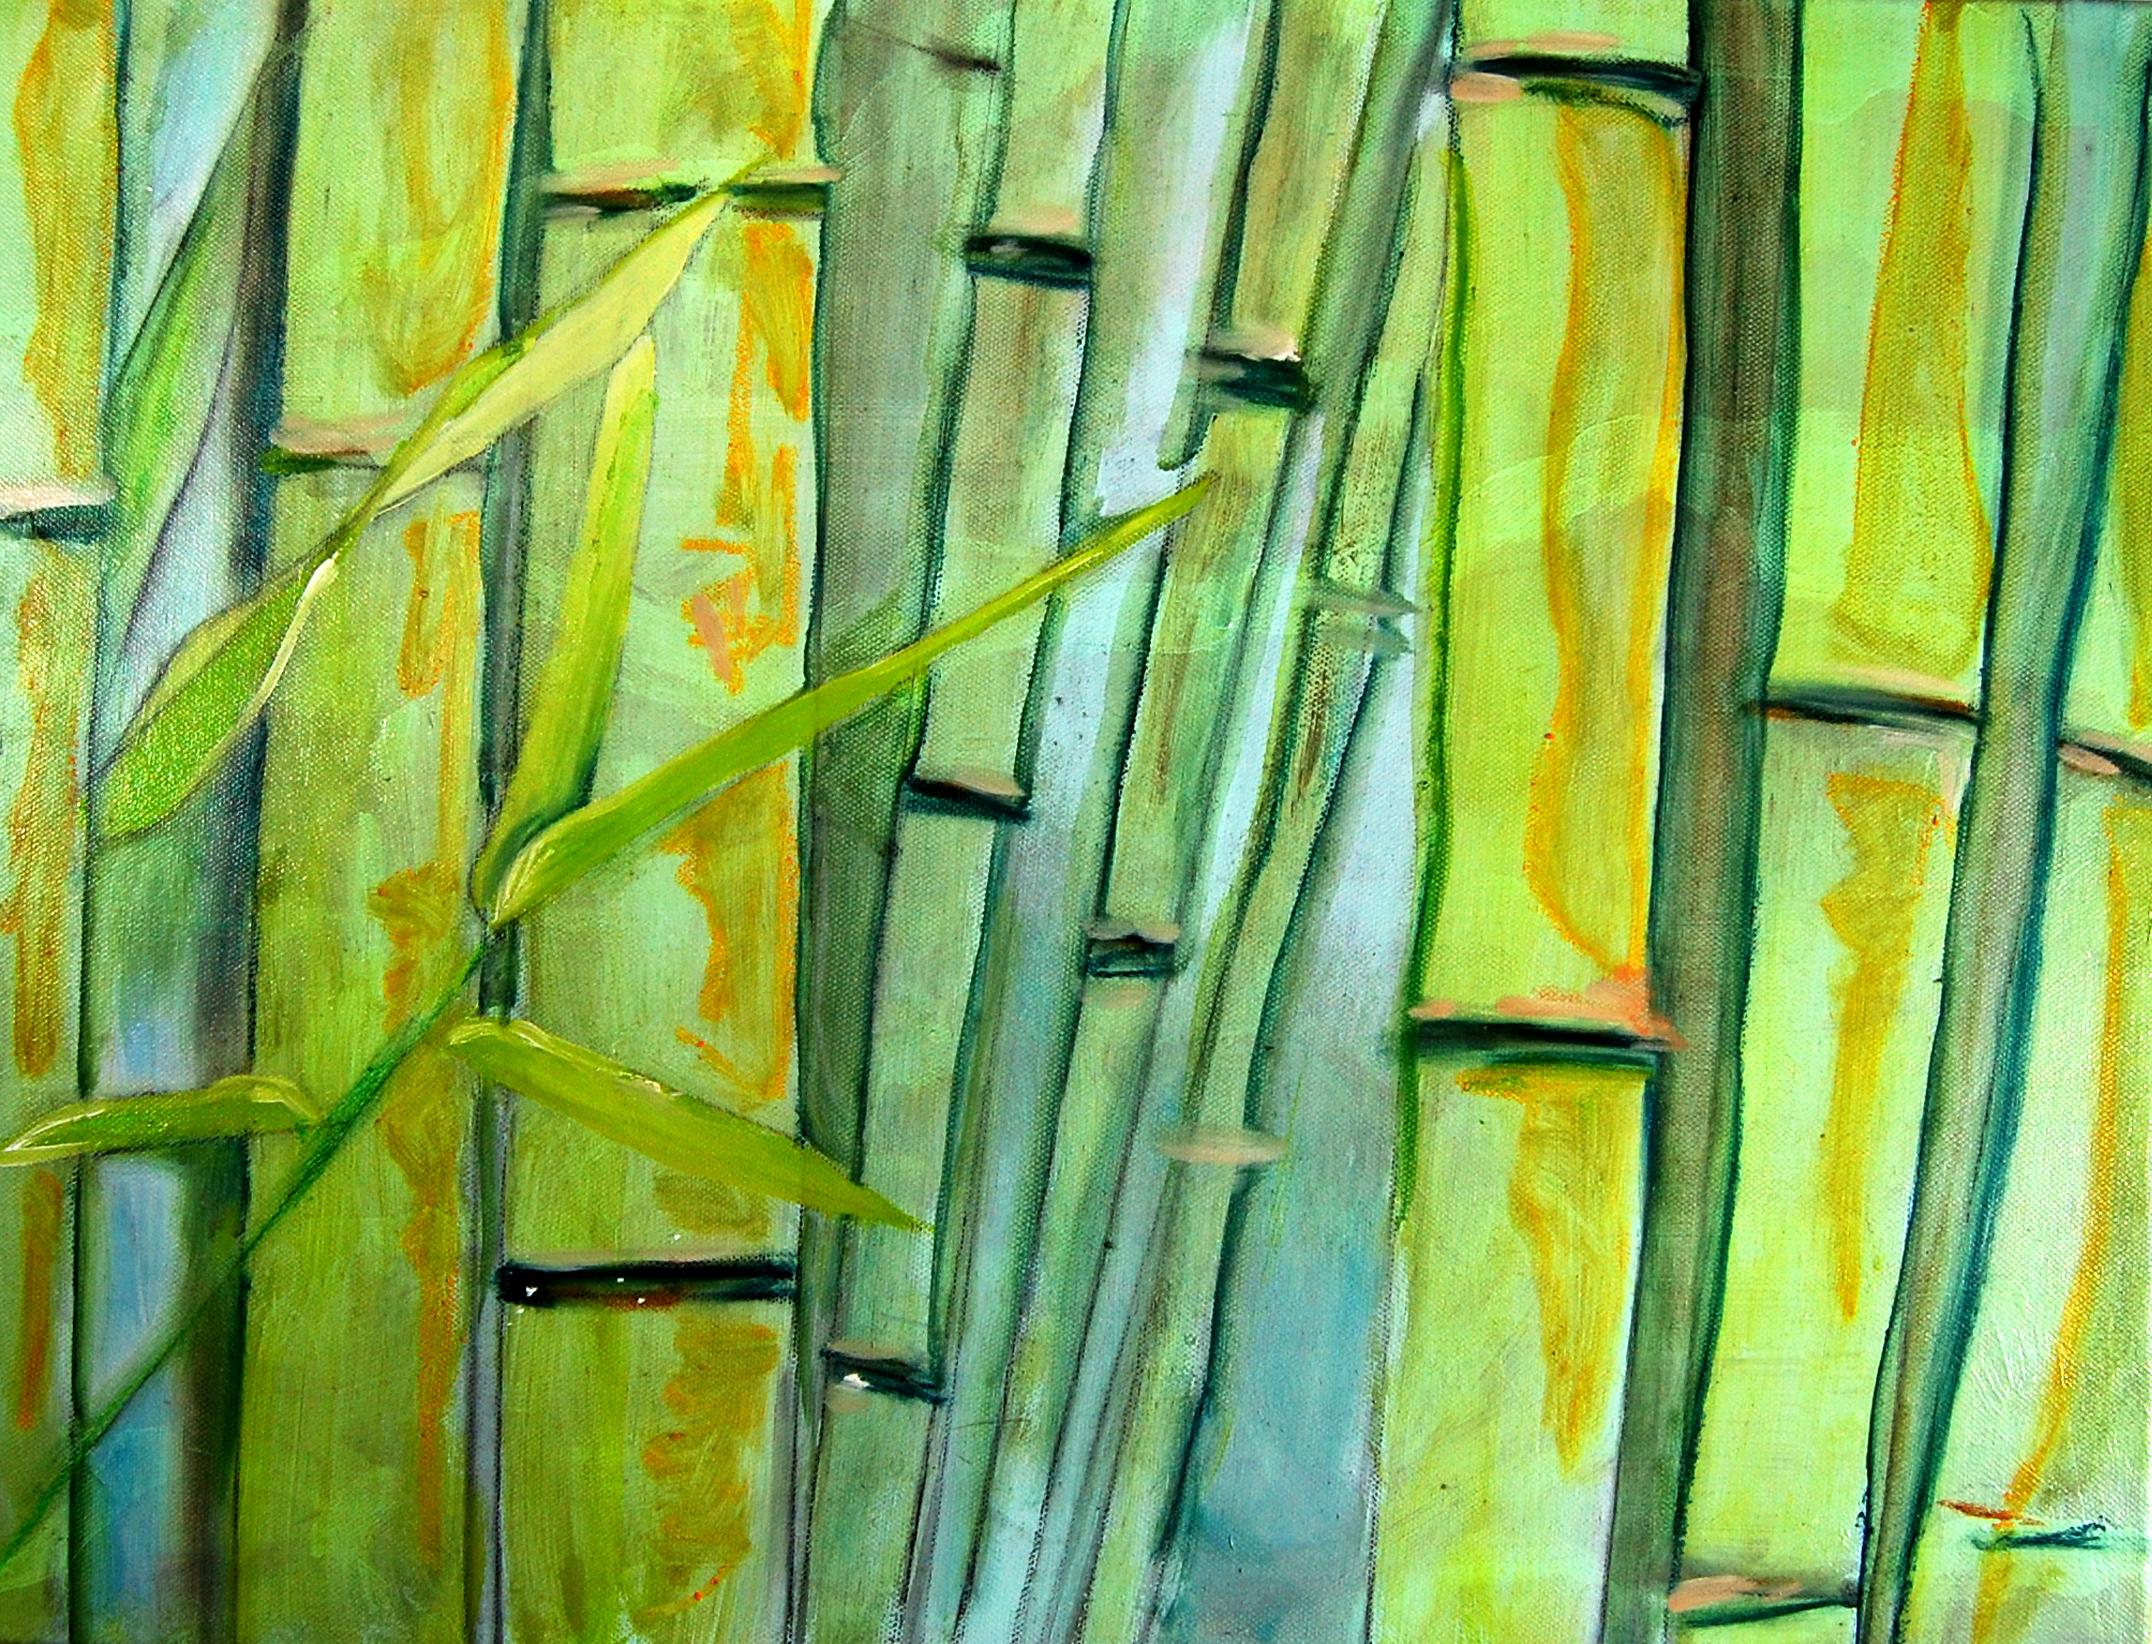 Bamboo Fine Art Painting